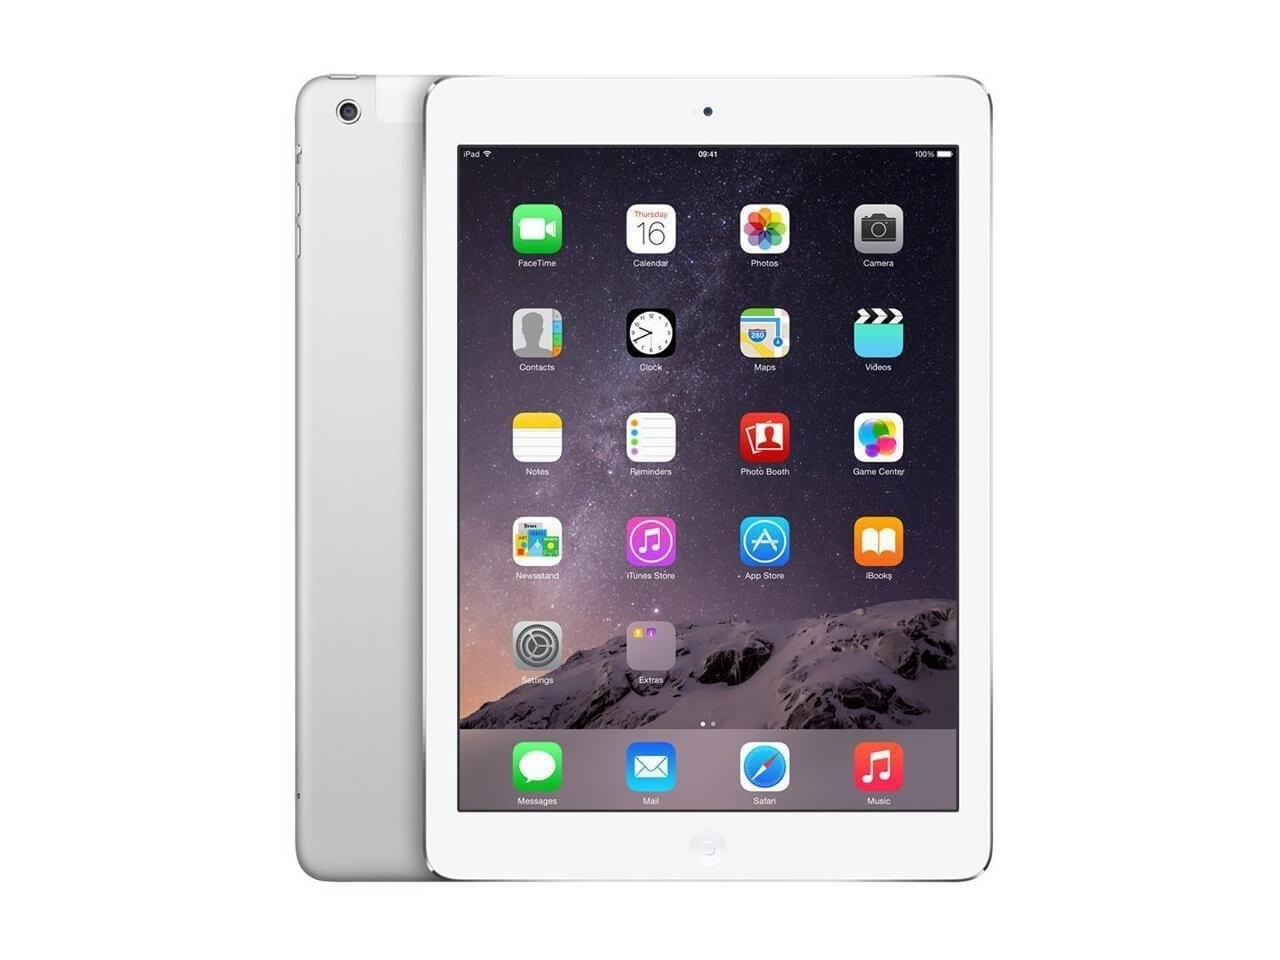 Apple iPad Air 2 - 64GB - 4G - White Silver - (Retina Display) - B Grade